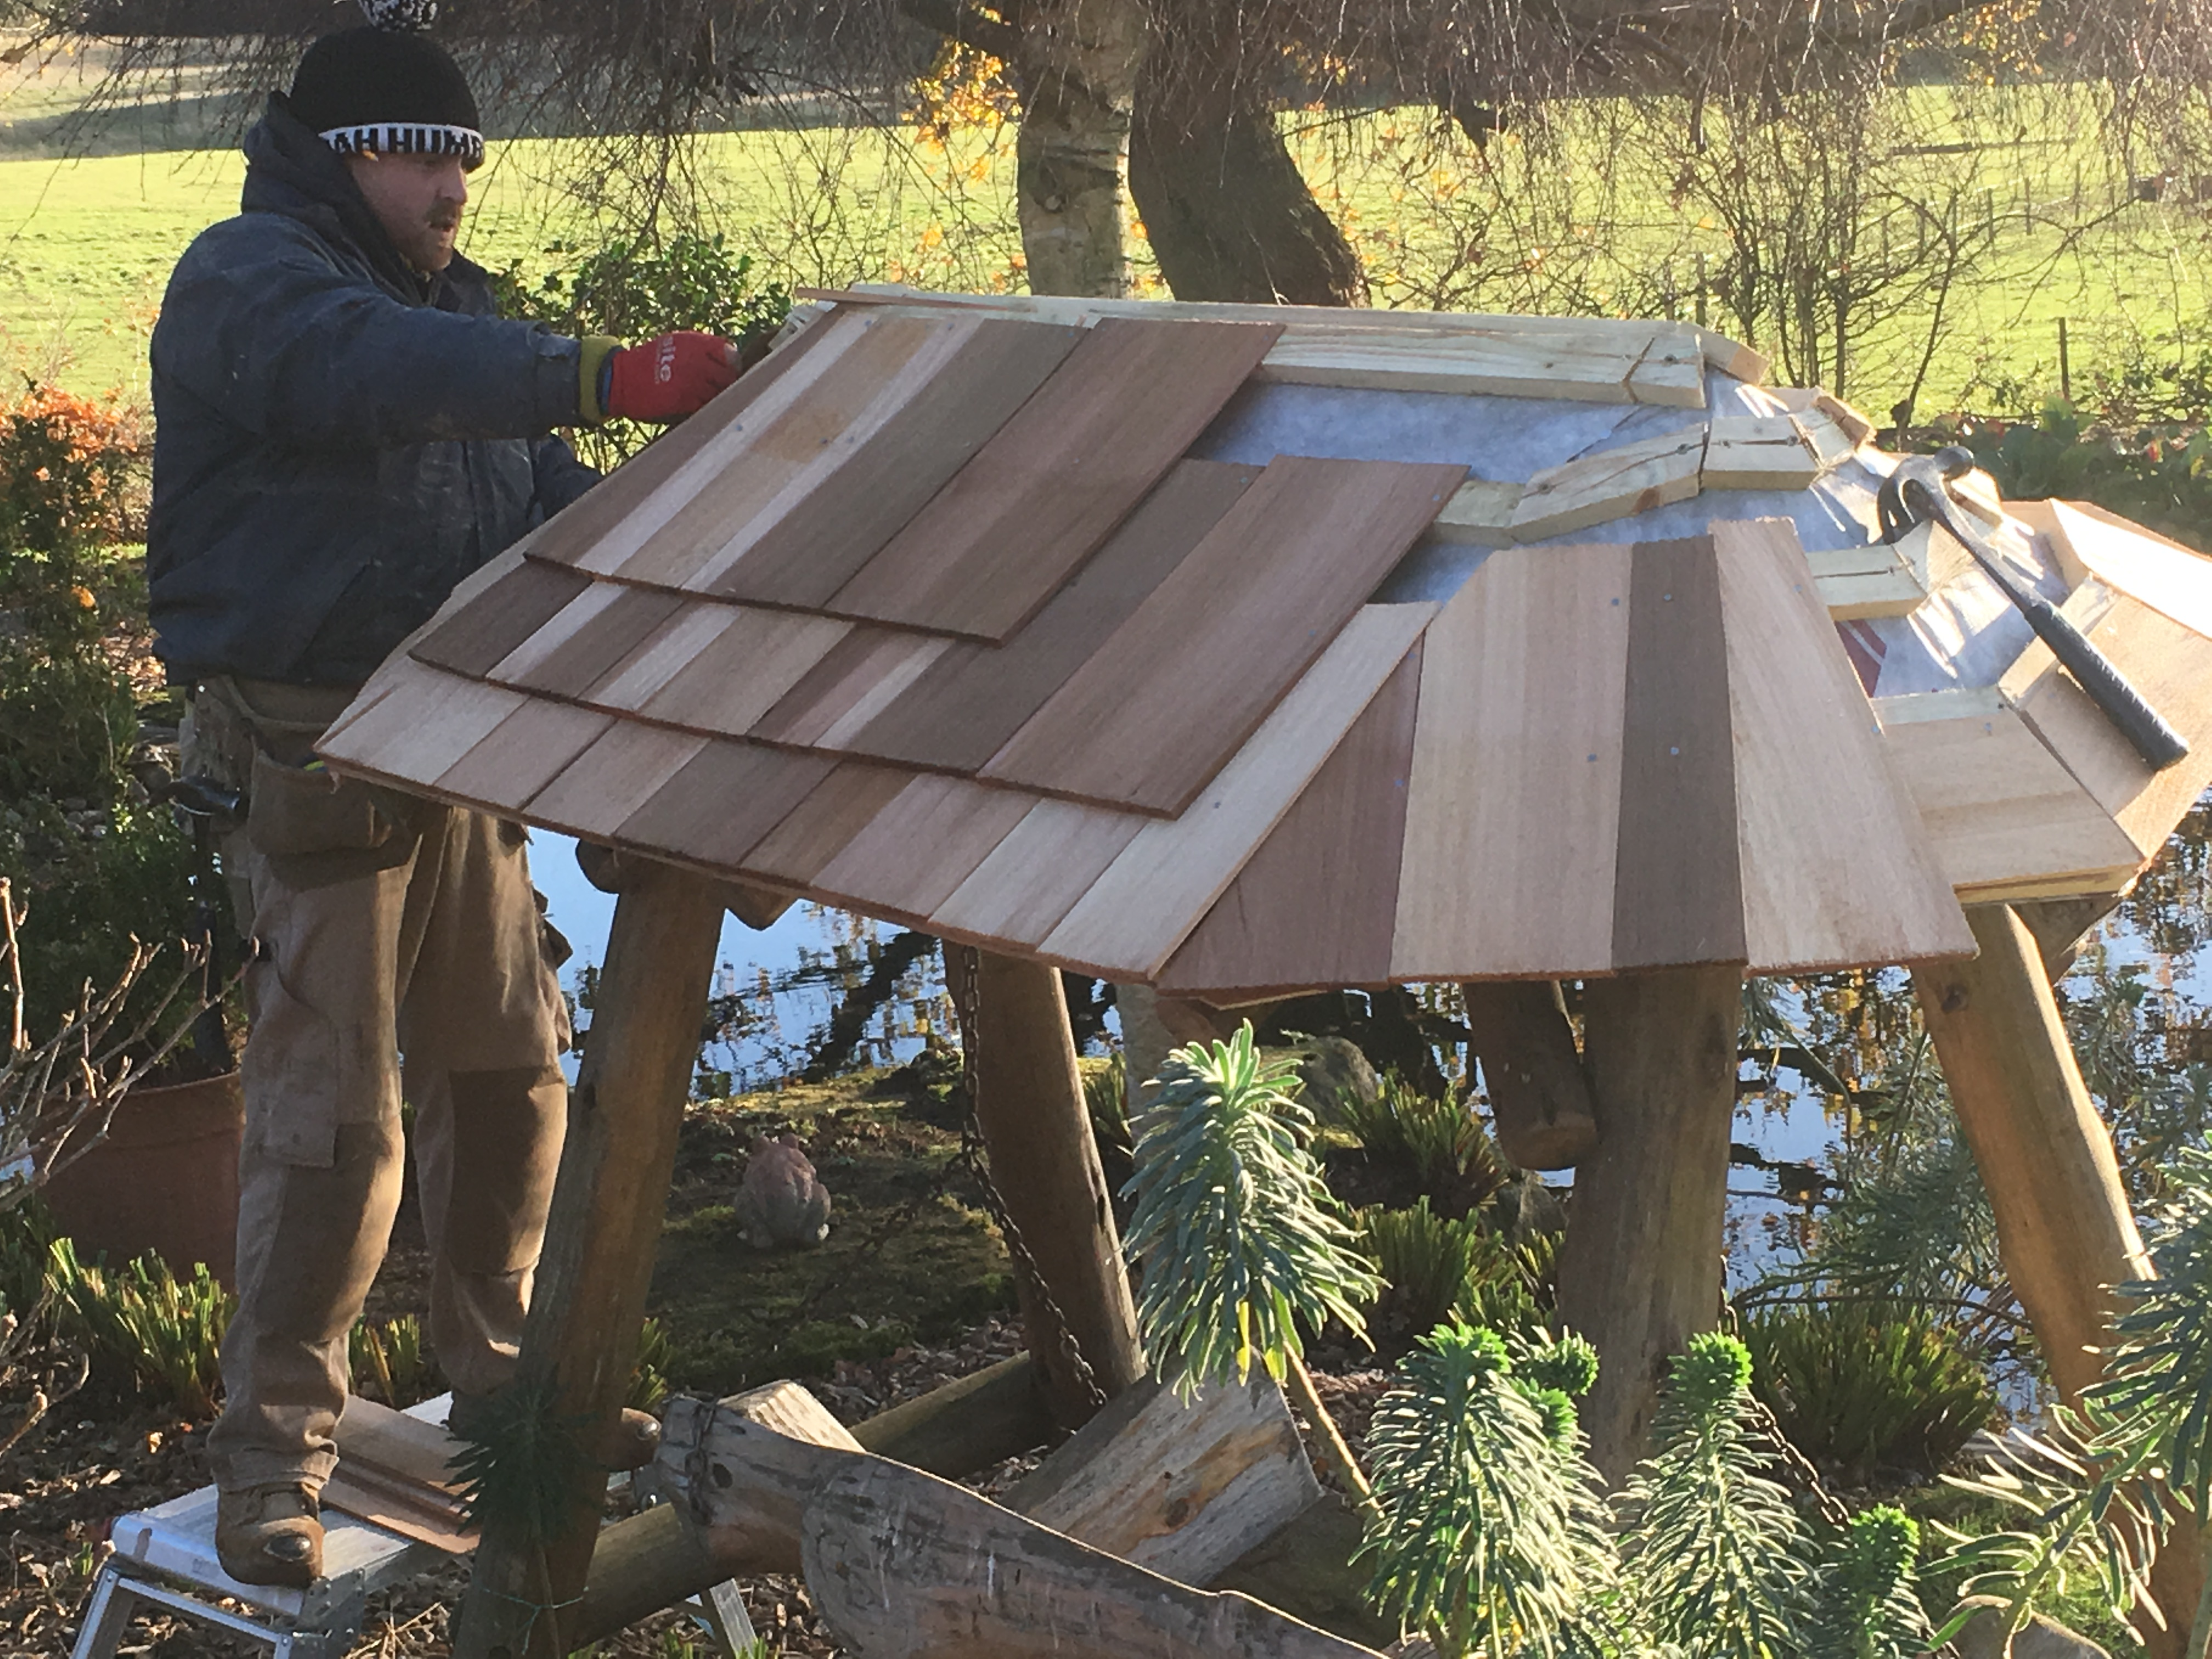 New cedar shingles on bench and pergola roof